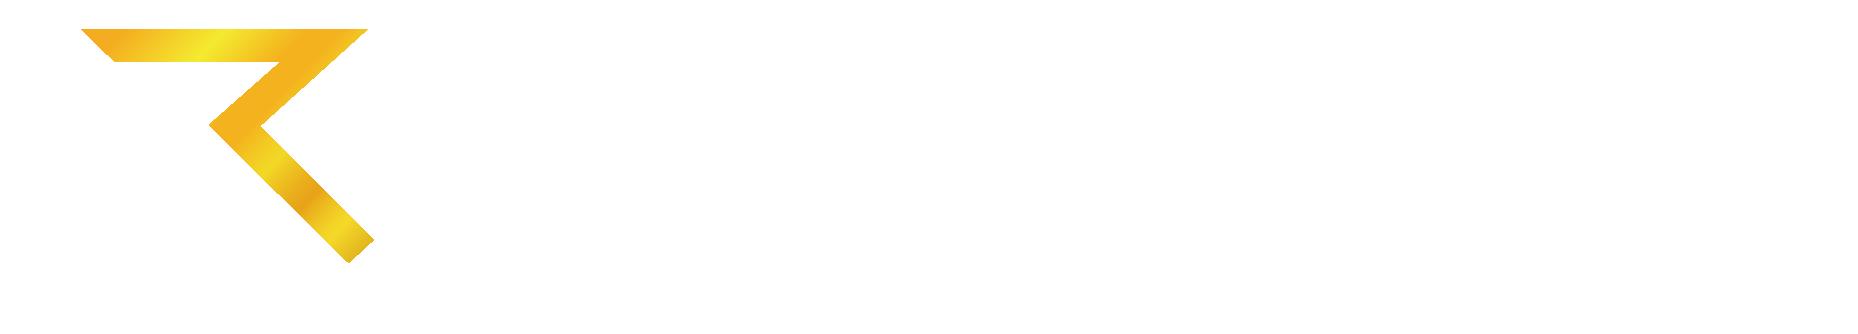 RFecu釋原力-About us